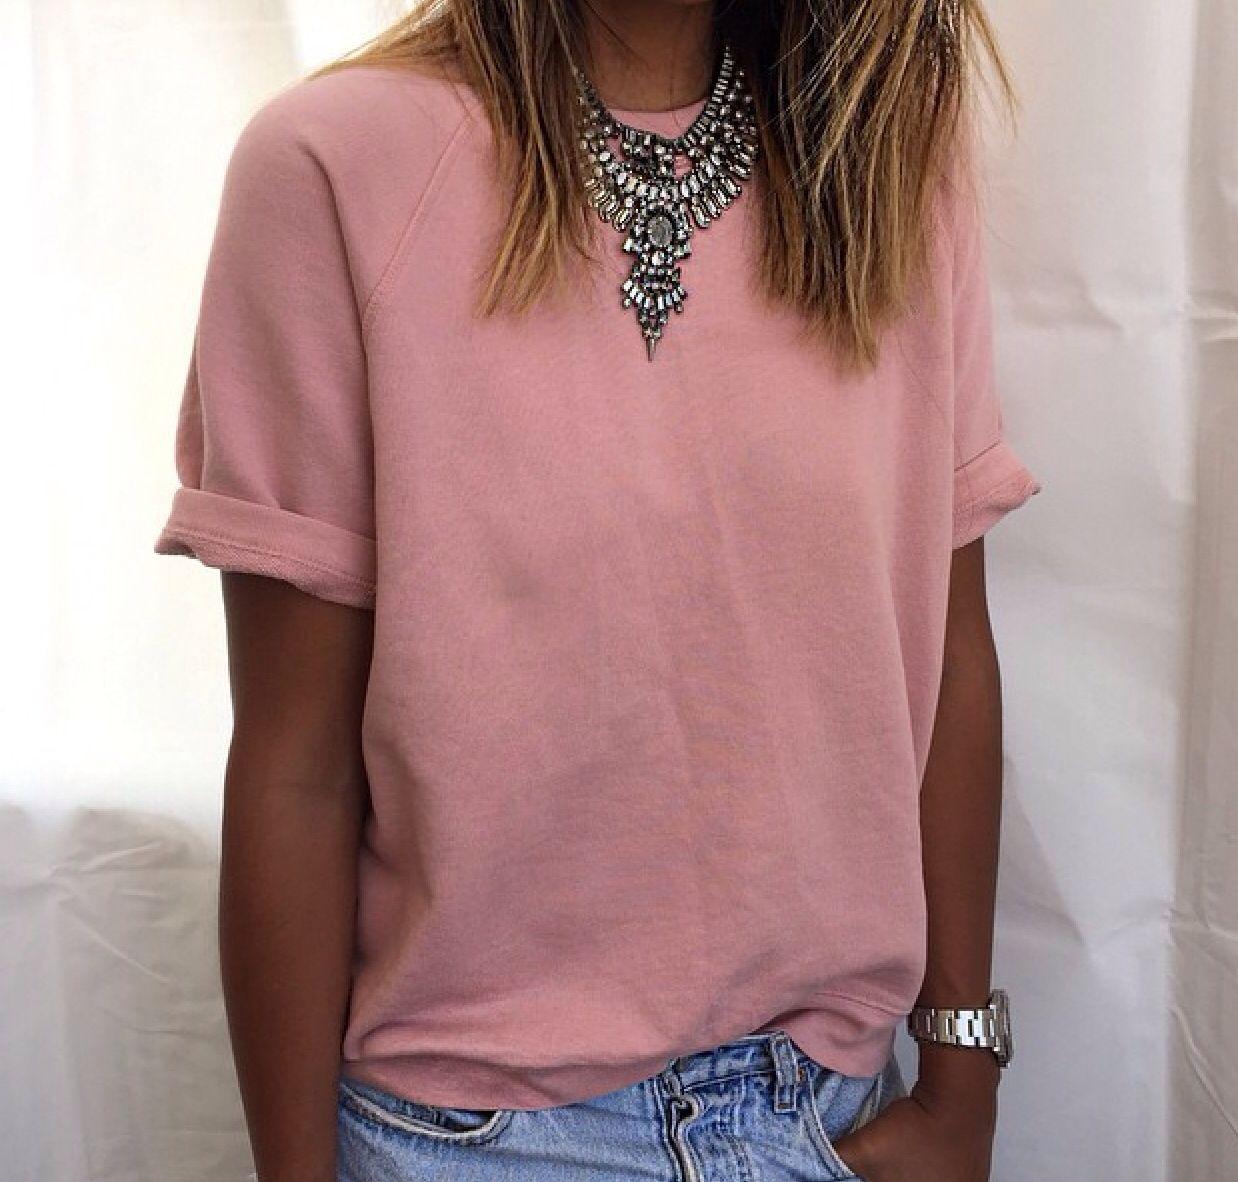 Casual pink dress shirt  pinterest morgangretaaa  Vaatetus  Pinterest  Clothes Clothing